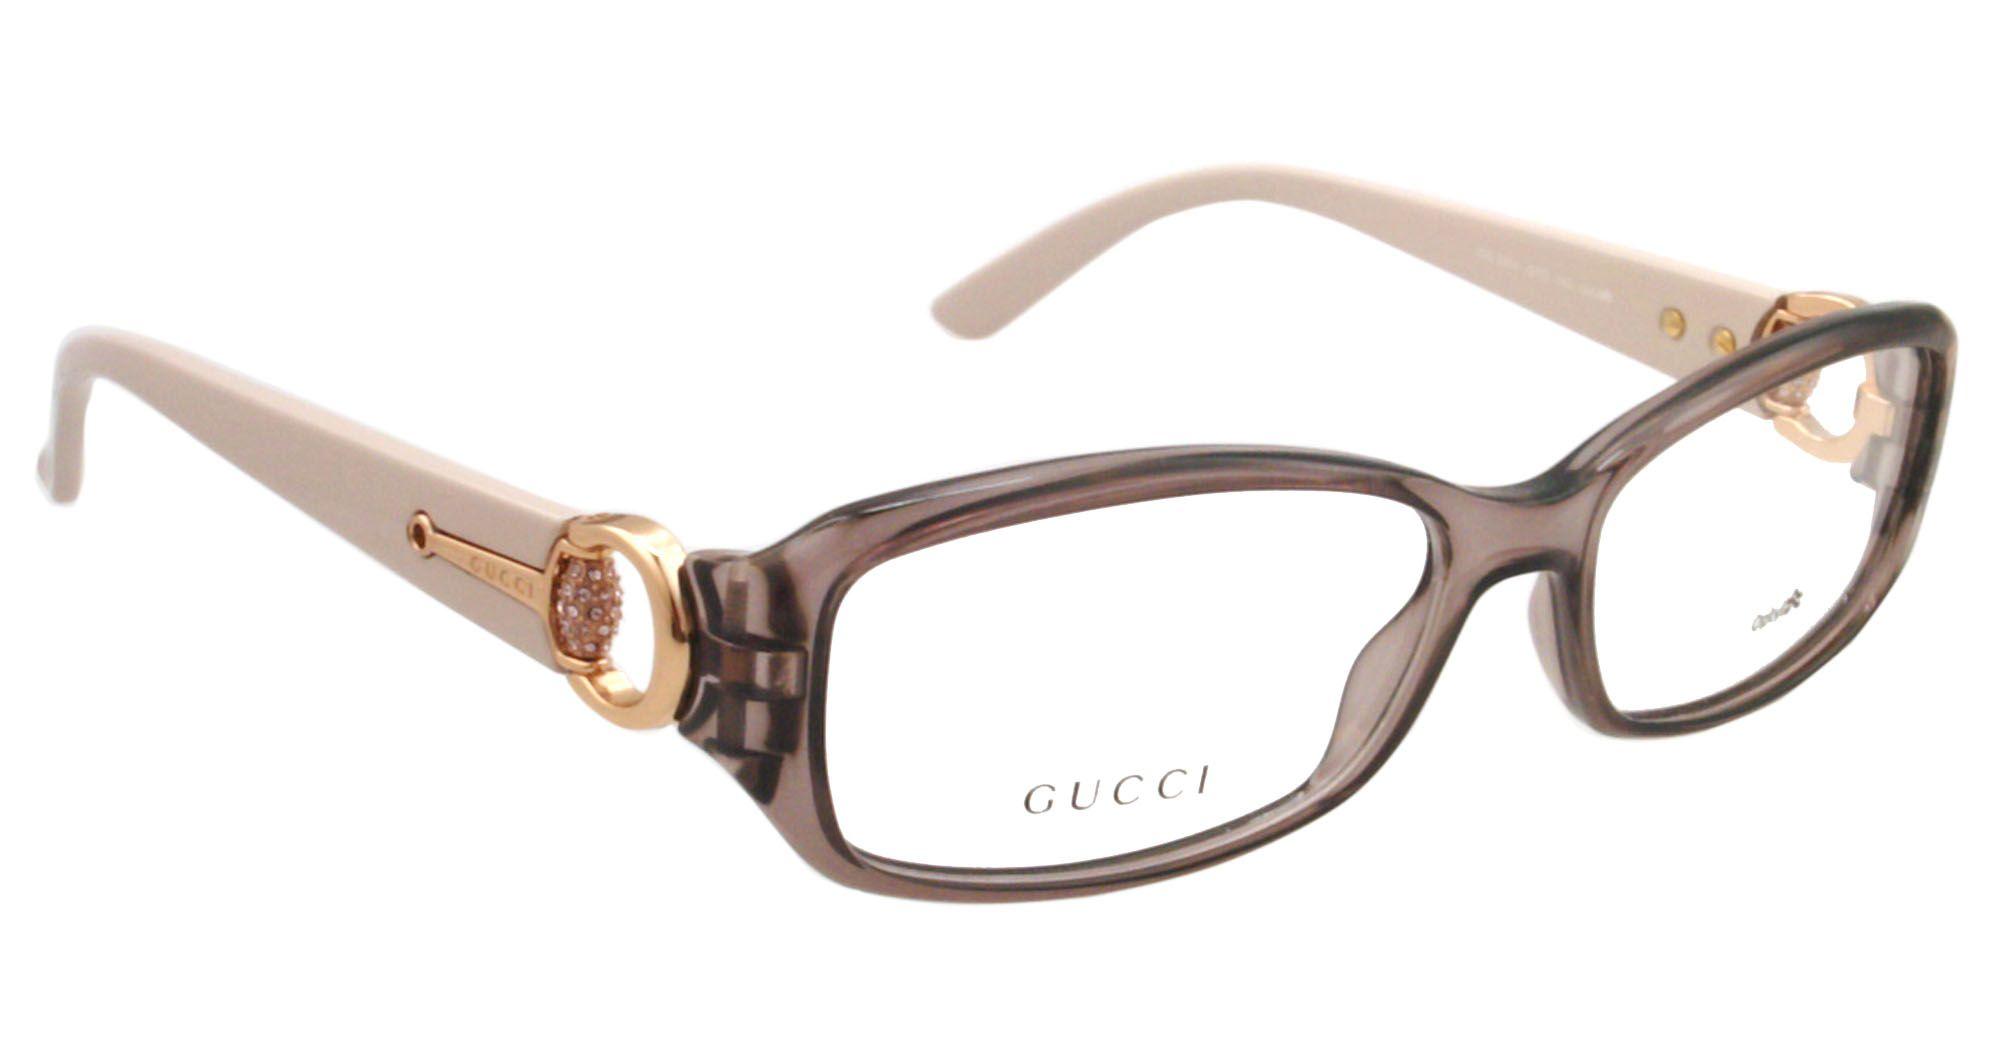 39ea715a3b0 NEW Gucci Eyeglasses GG 3204 MAUVE BLUSH Q70 GG3204 AUTH